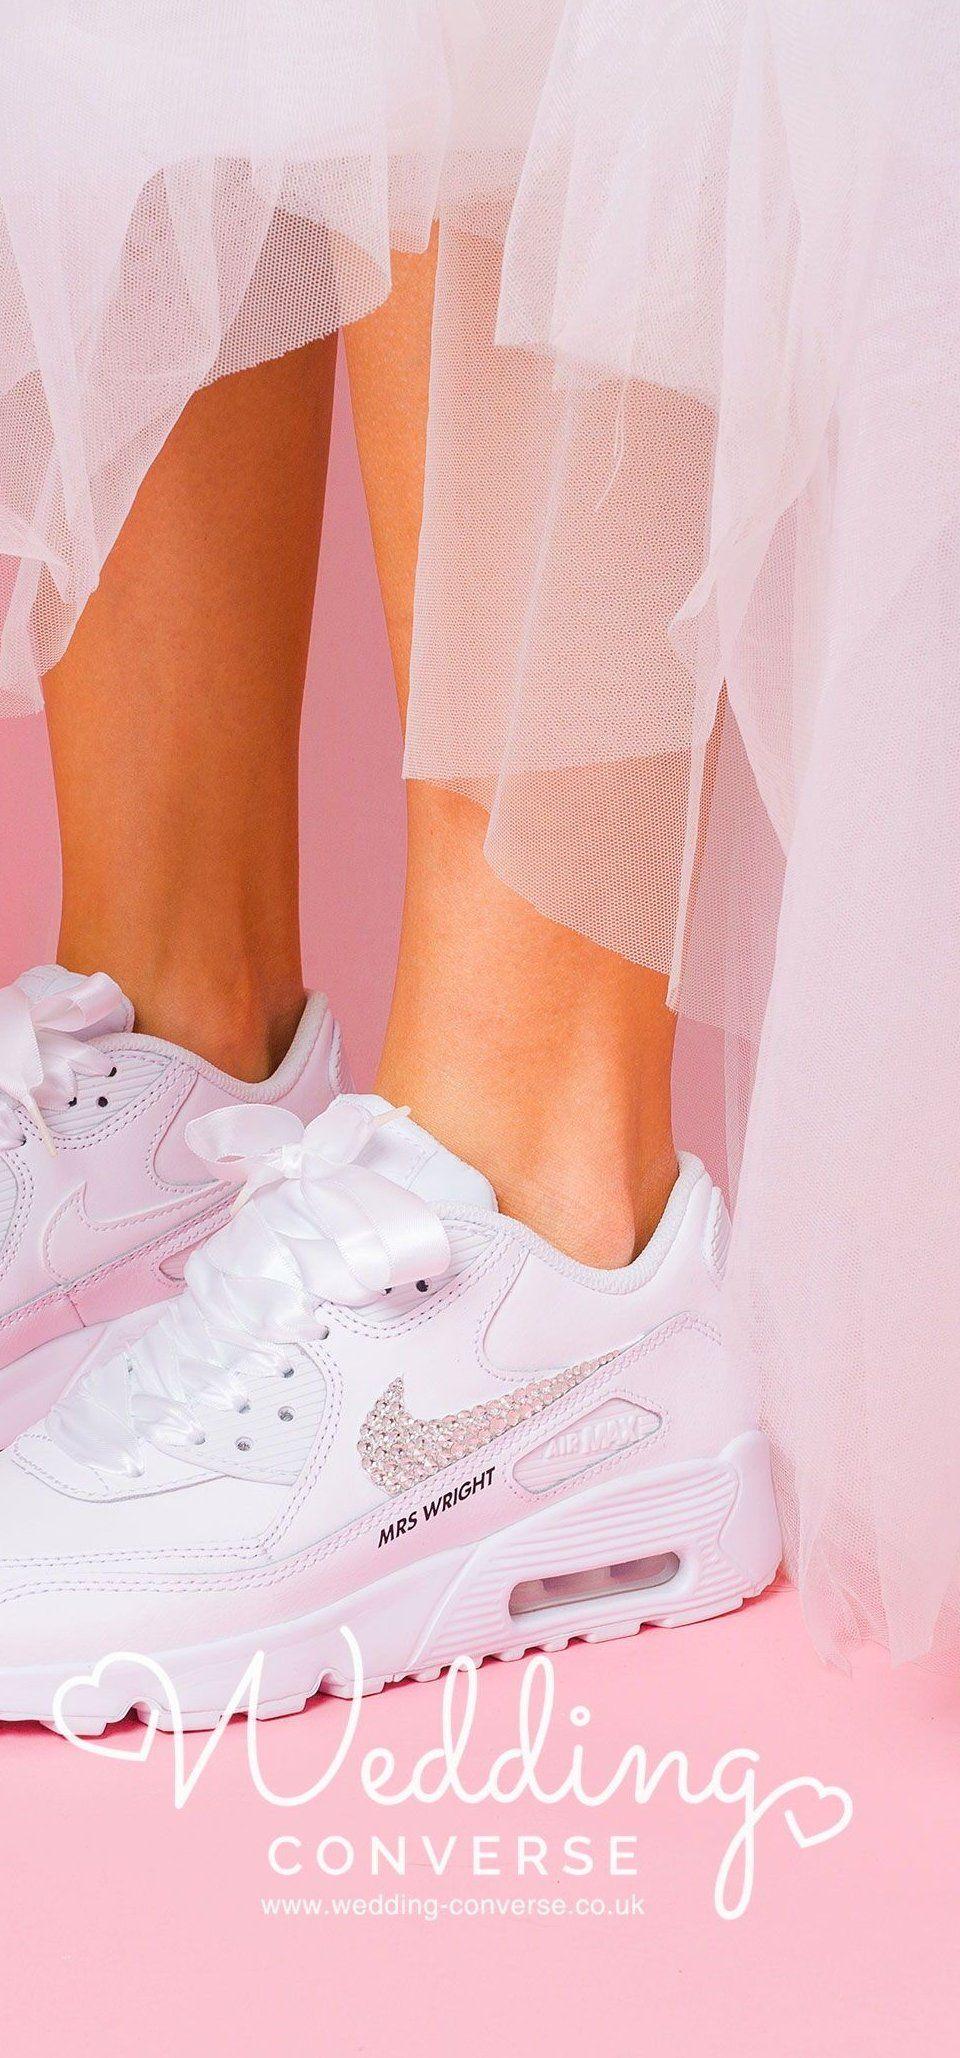 Nike Wedding Shoes L Nike Wedding Sneaker Nike Wedding Trainers Wedding Flats For Bride Bling Wedding Tennis Shoes Wedding Sneakers Bride Sneakers